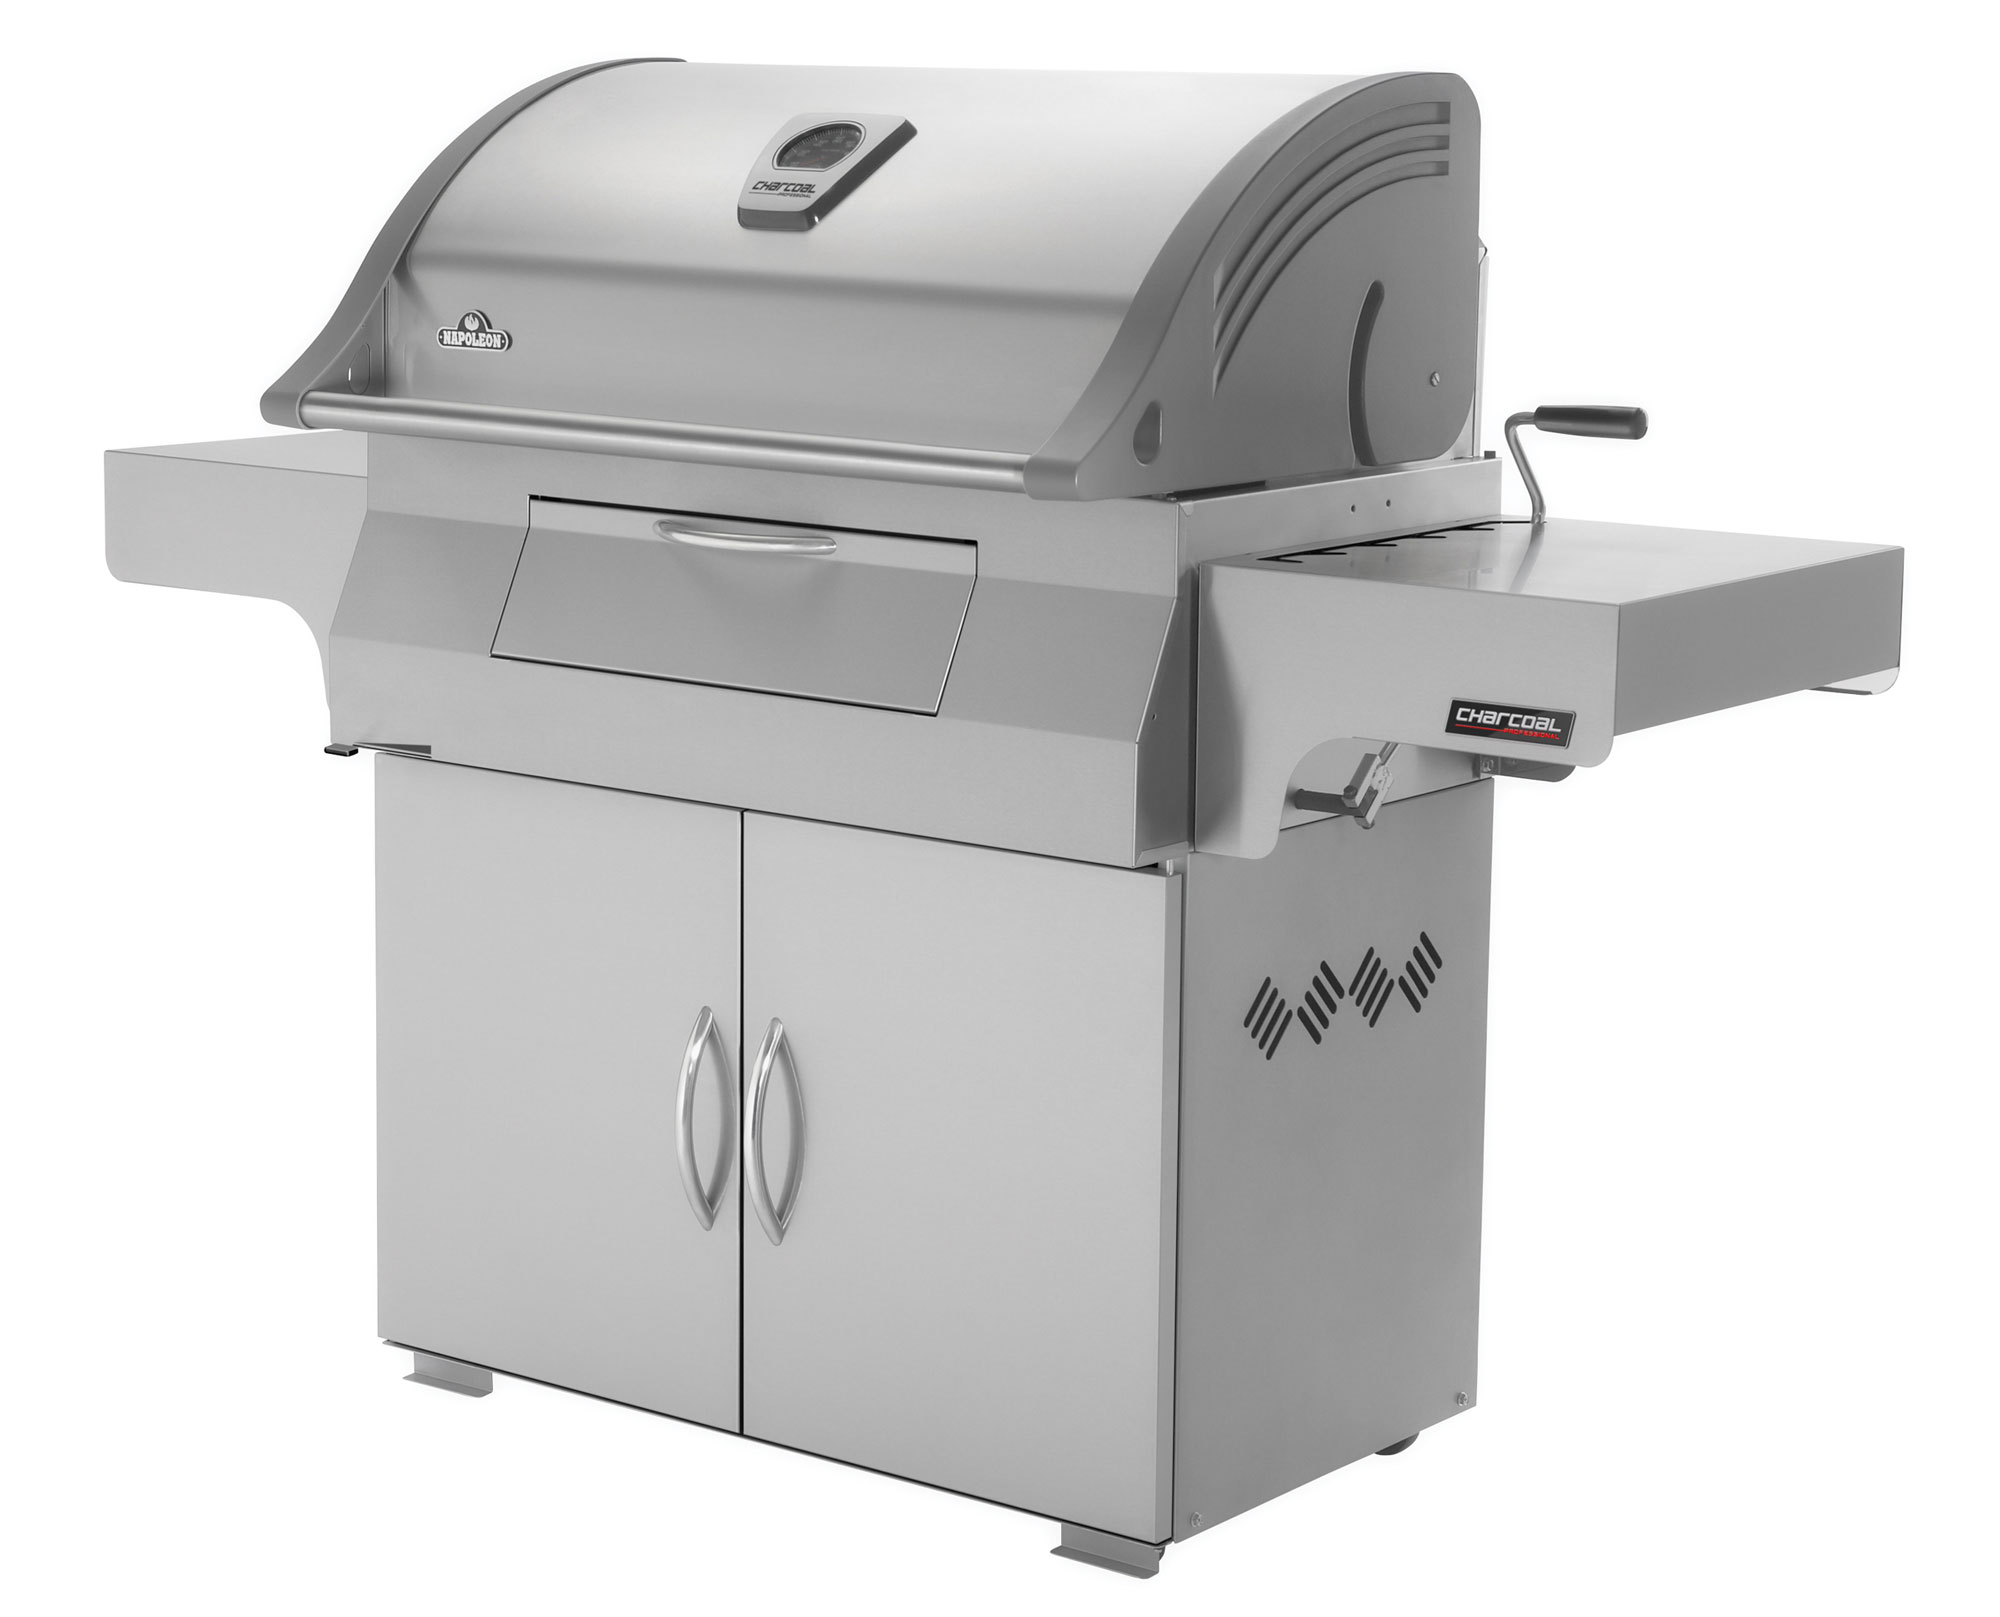 Napoleon Holzkohlegrill Charcoal : Holzkohlegrill grill napoleon charcoal professional pro605